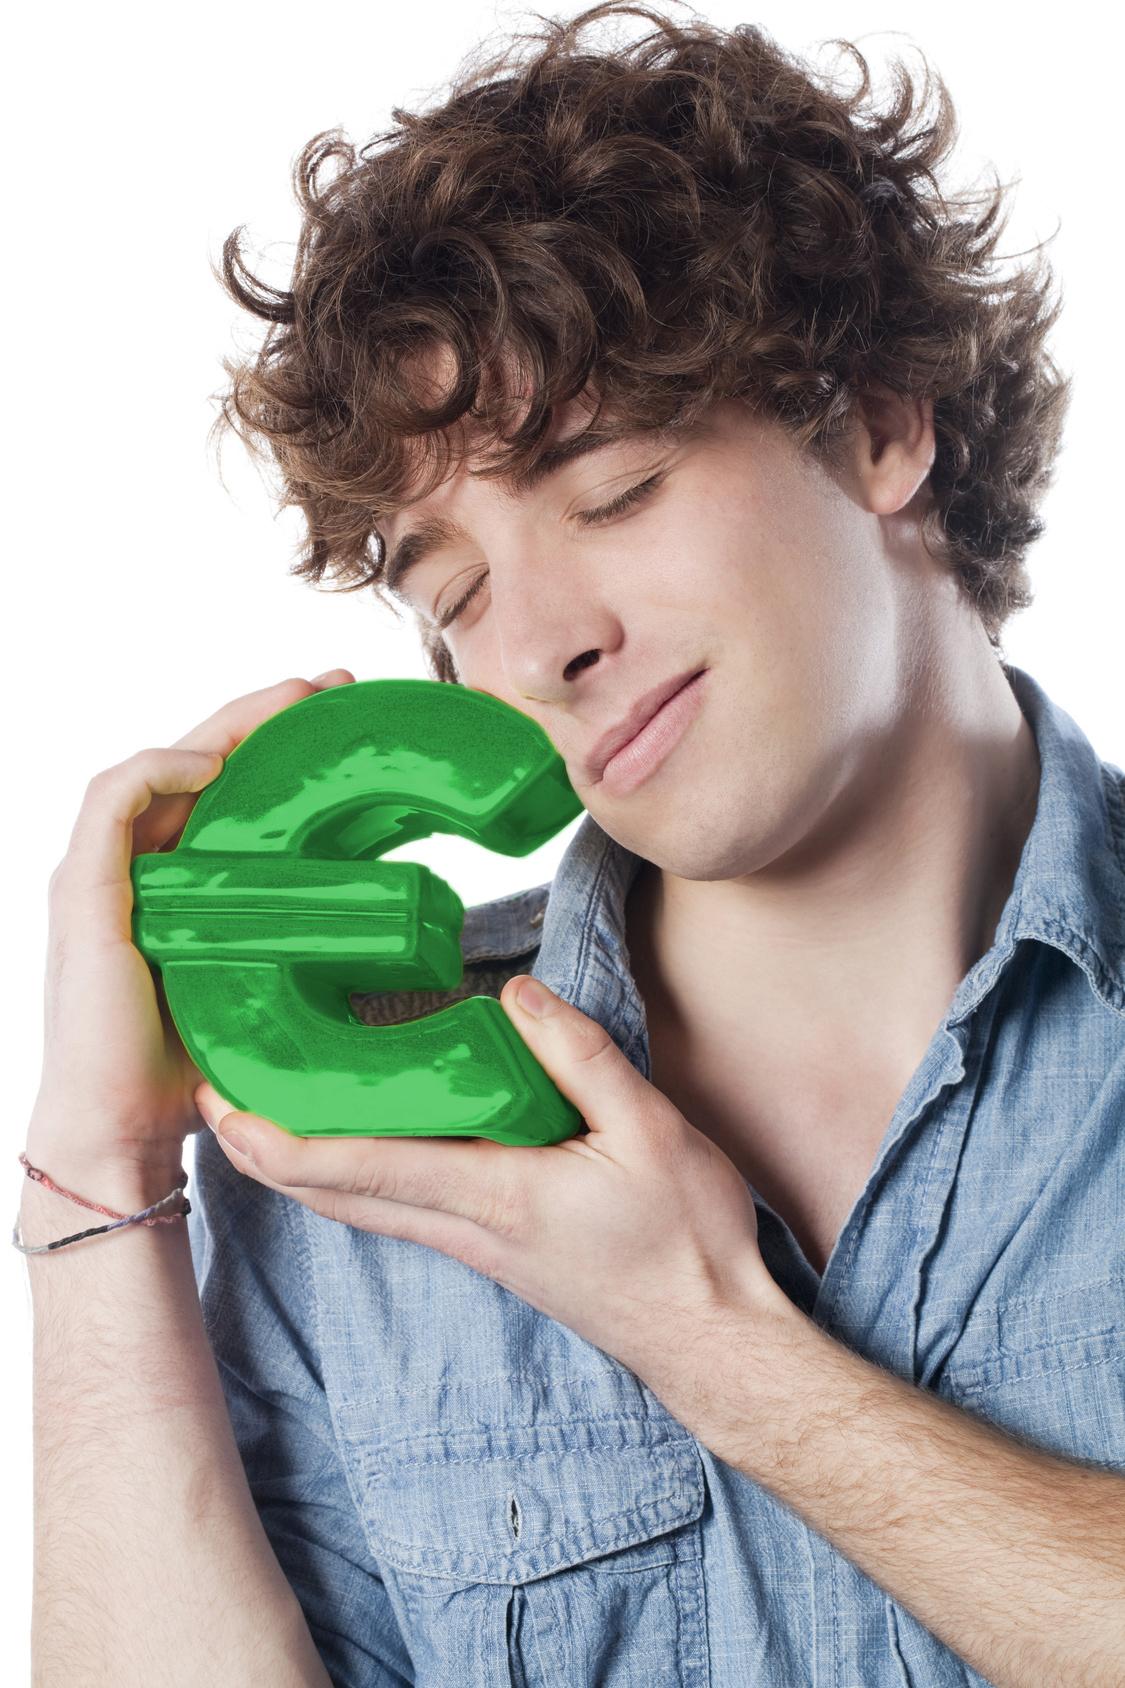 Obrisi momka koji drži zagrljen logo eura.